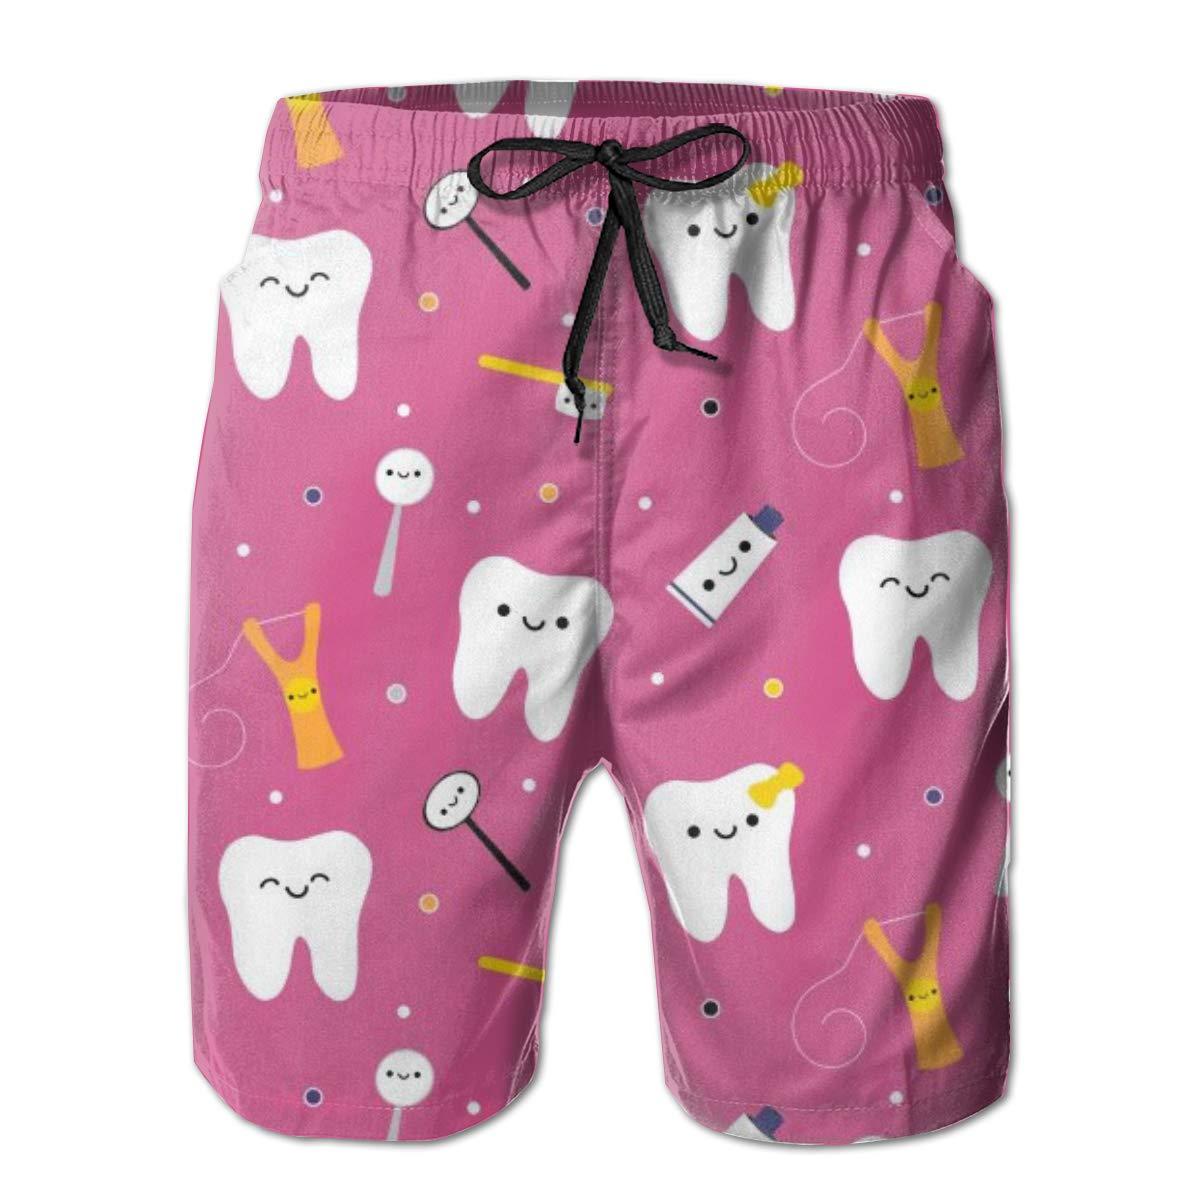 Mens Swim Trunks Dentistry Happy Teeth Friends Beach Board Shorts Quick Dry Sports Running Swim Board Shorts with Pockets Mesh Lining